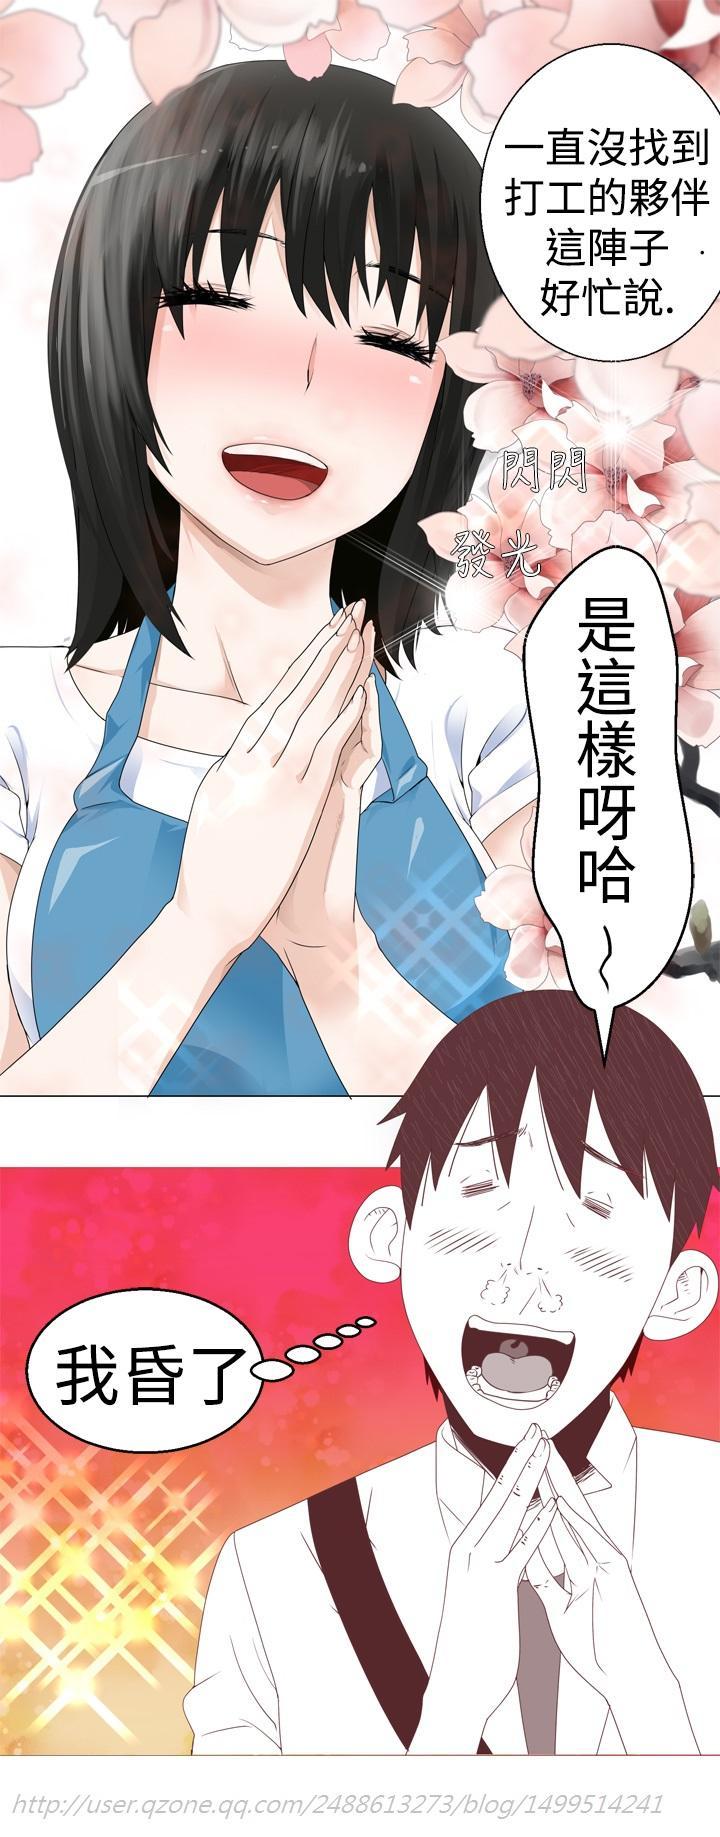 [SOSO] Franken Jo 为爱而生 法兰克赵 Ch.1~19 [Chinese]中文 40